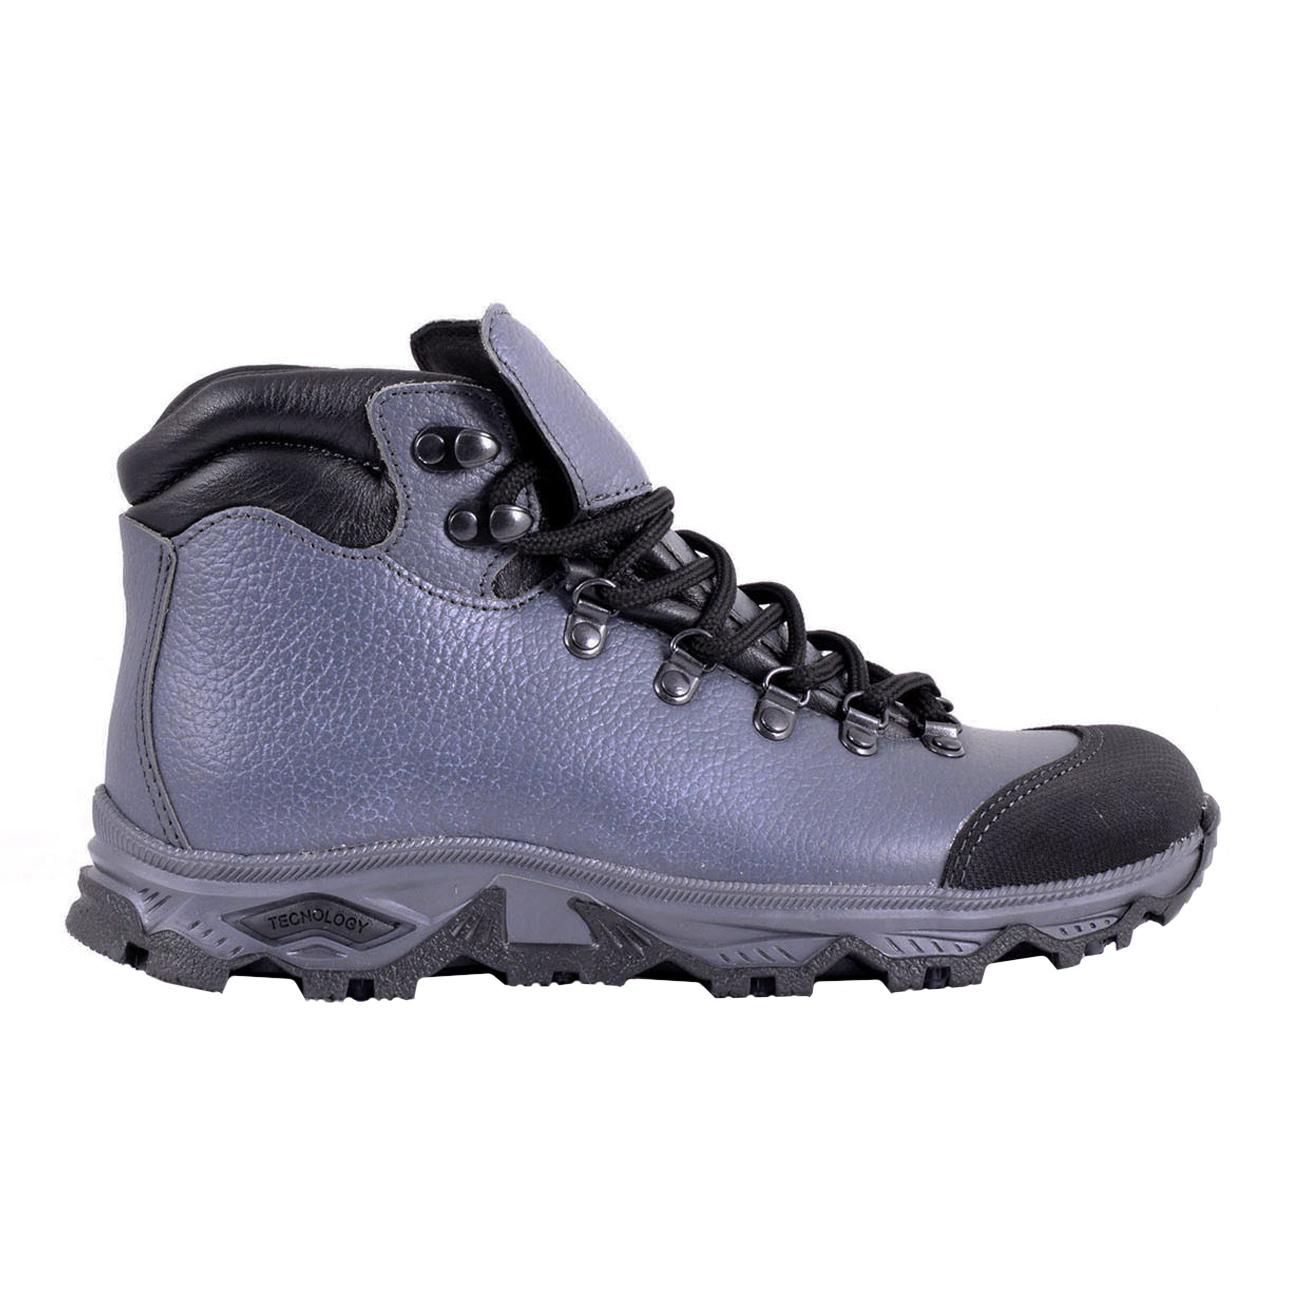 Купить Ботинки TREK Fiord3 (капровелюр), Обувная фабрика Trek